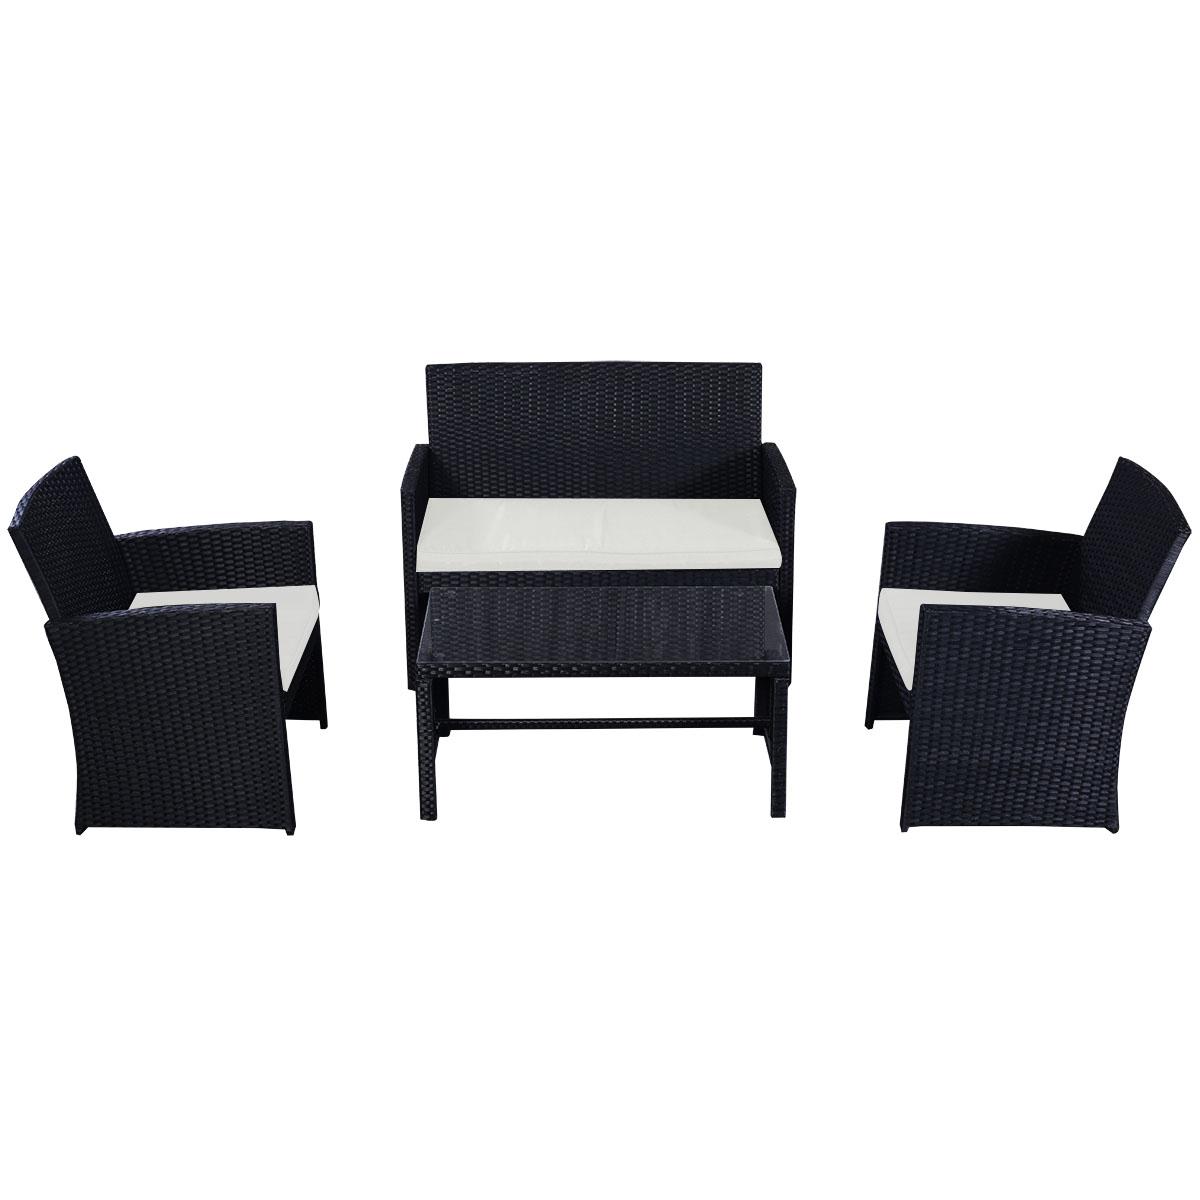 3 seater rattan effect mini corner sofa black modern beds vancouver